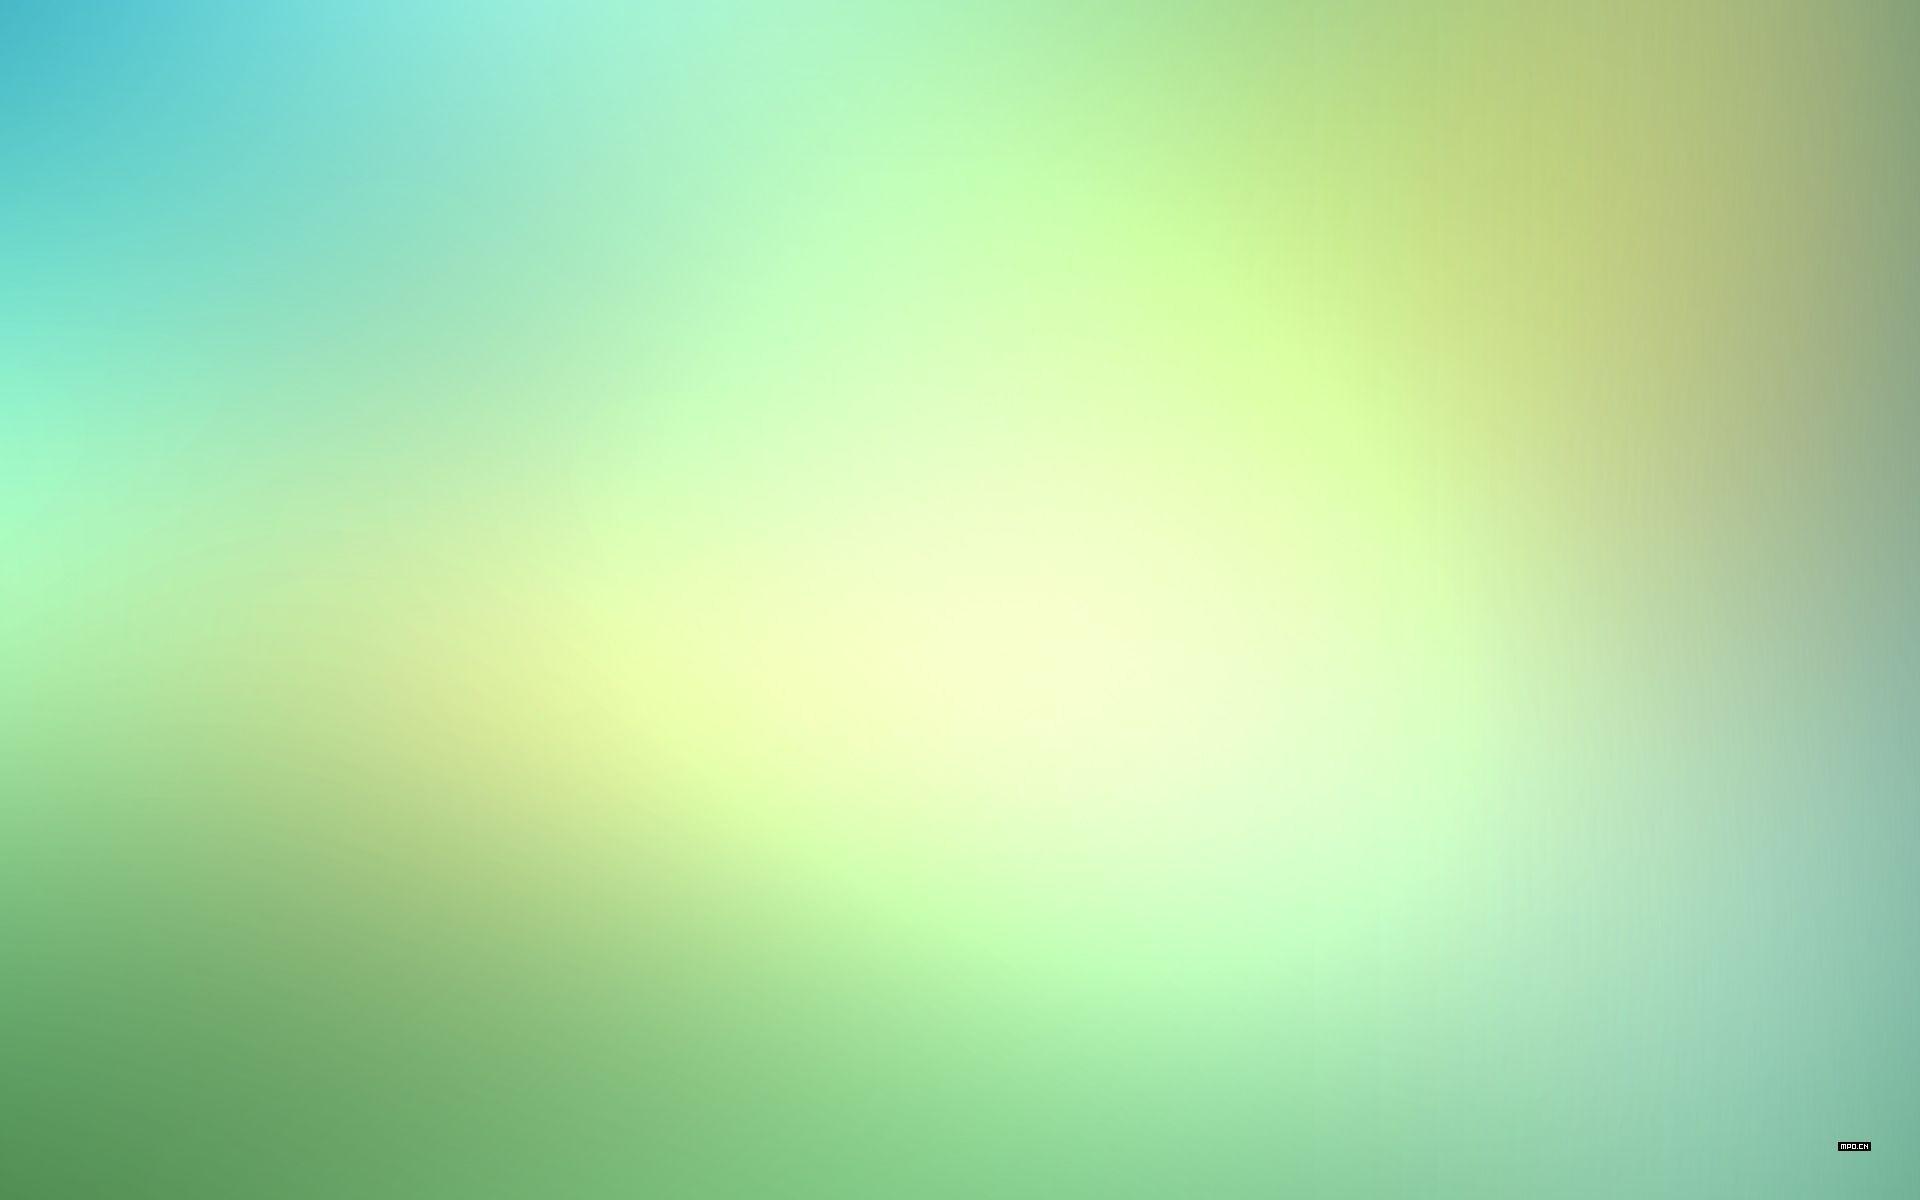 Soft Color Wallpaper 11615 Desktop Backgrounds   Areahd.